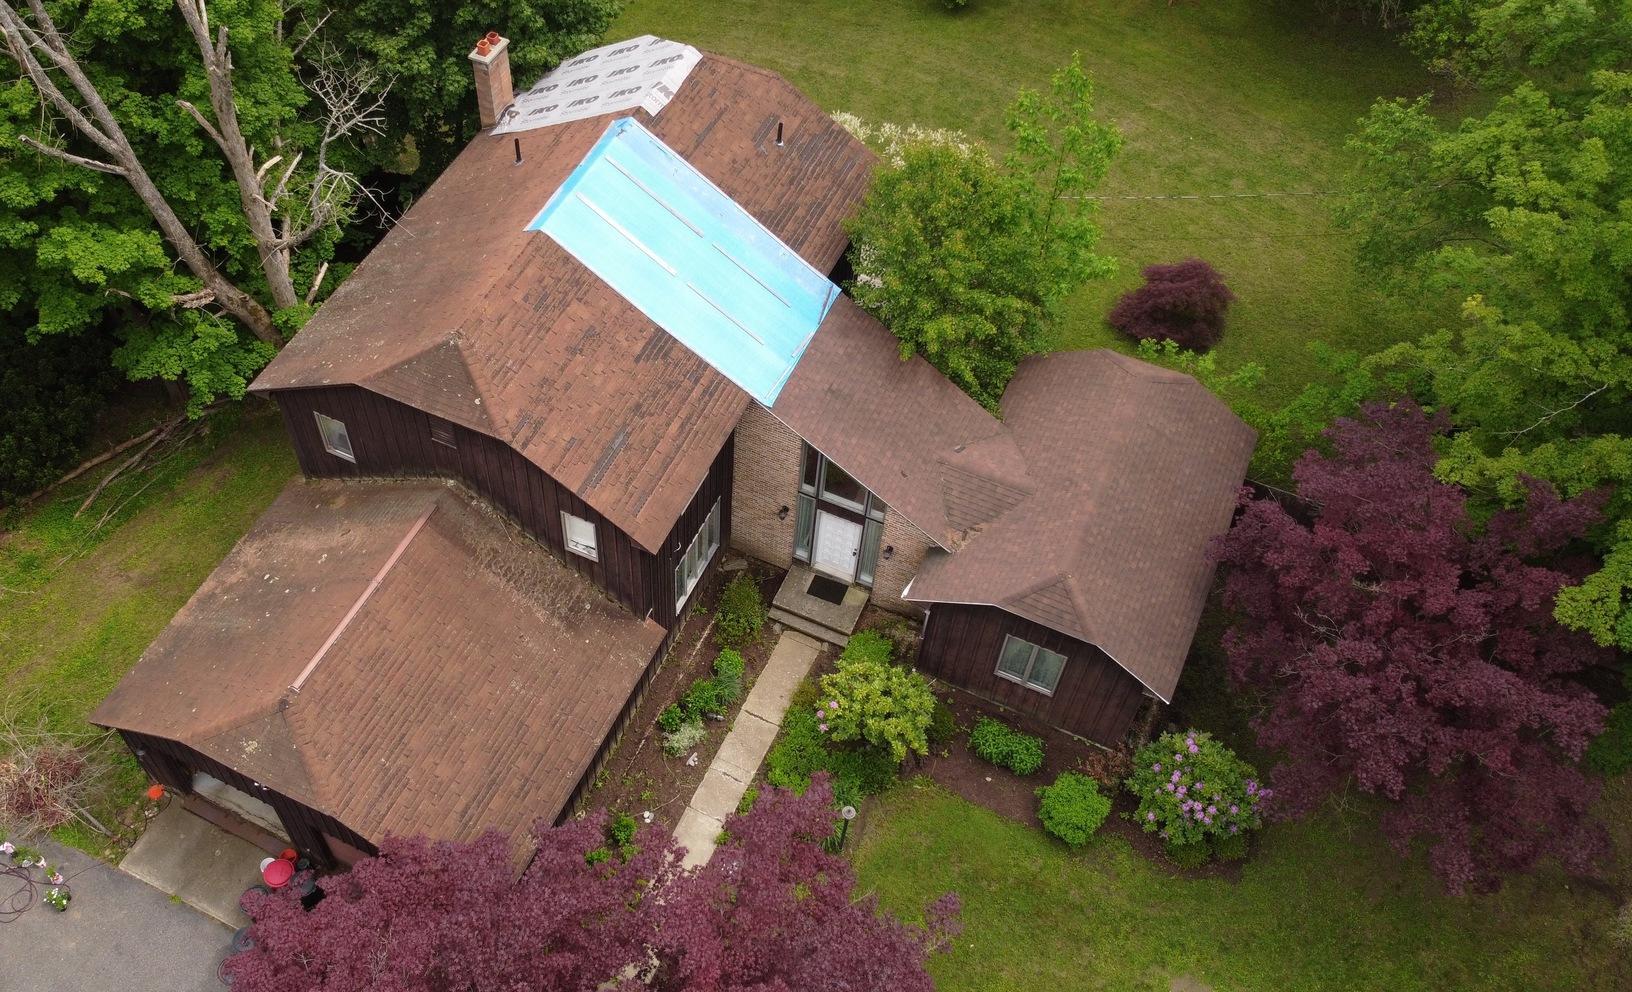 Lenox, MA Roof Replacement IKO Dynasty Granite Black Shingles - Before Photo